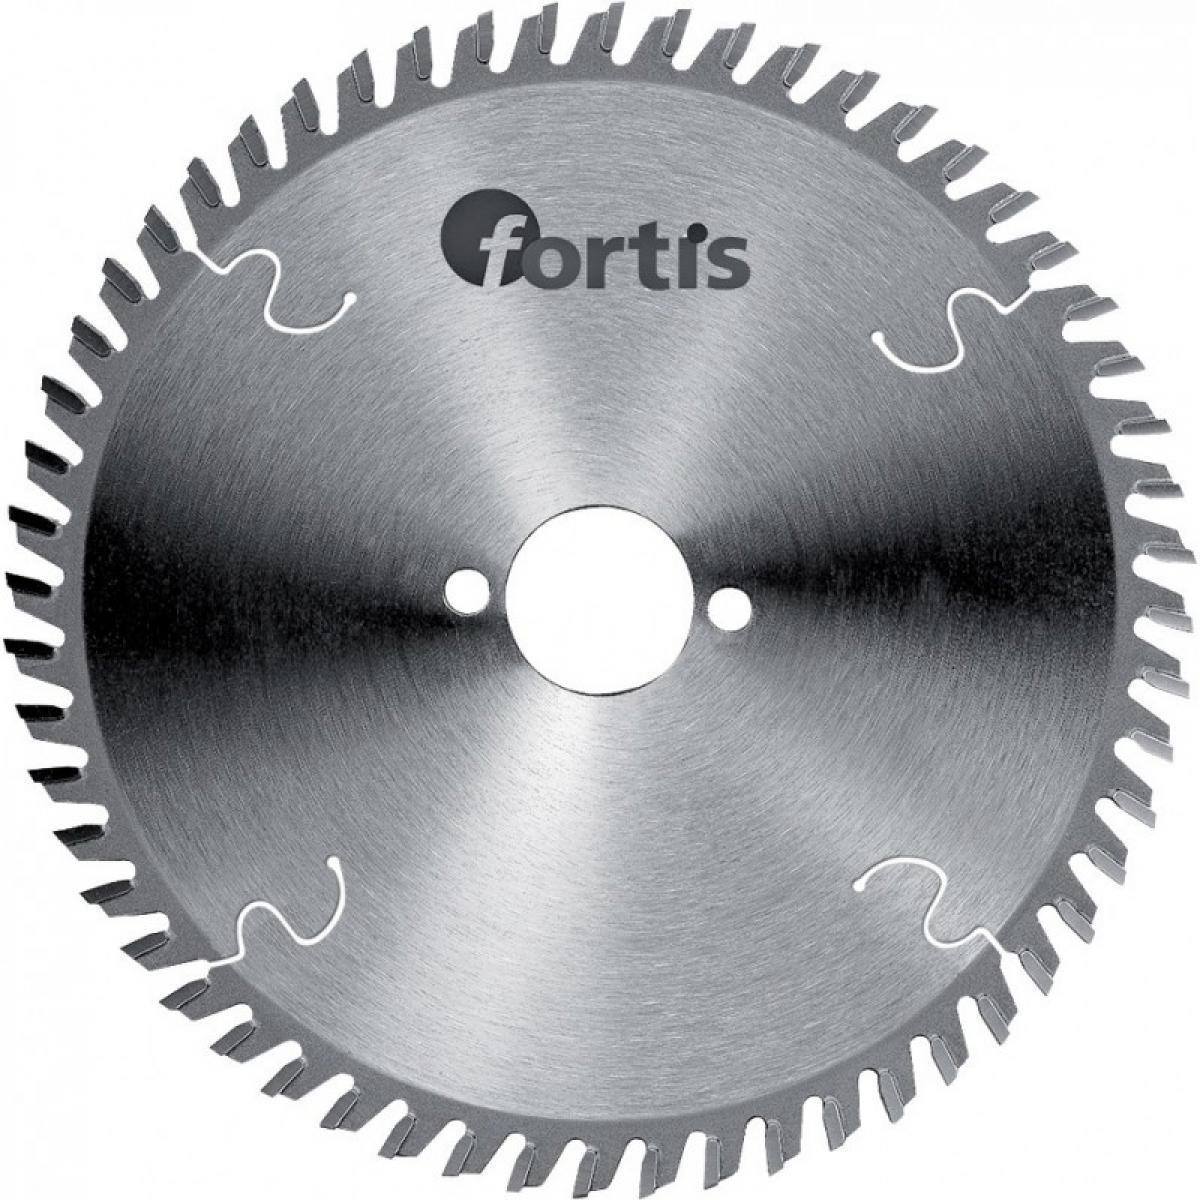 Fortis HW-Lame scie 160x2,8 x20mm Z48W Fortis